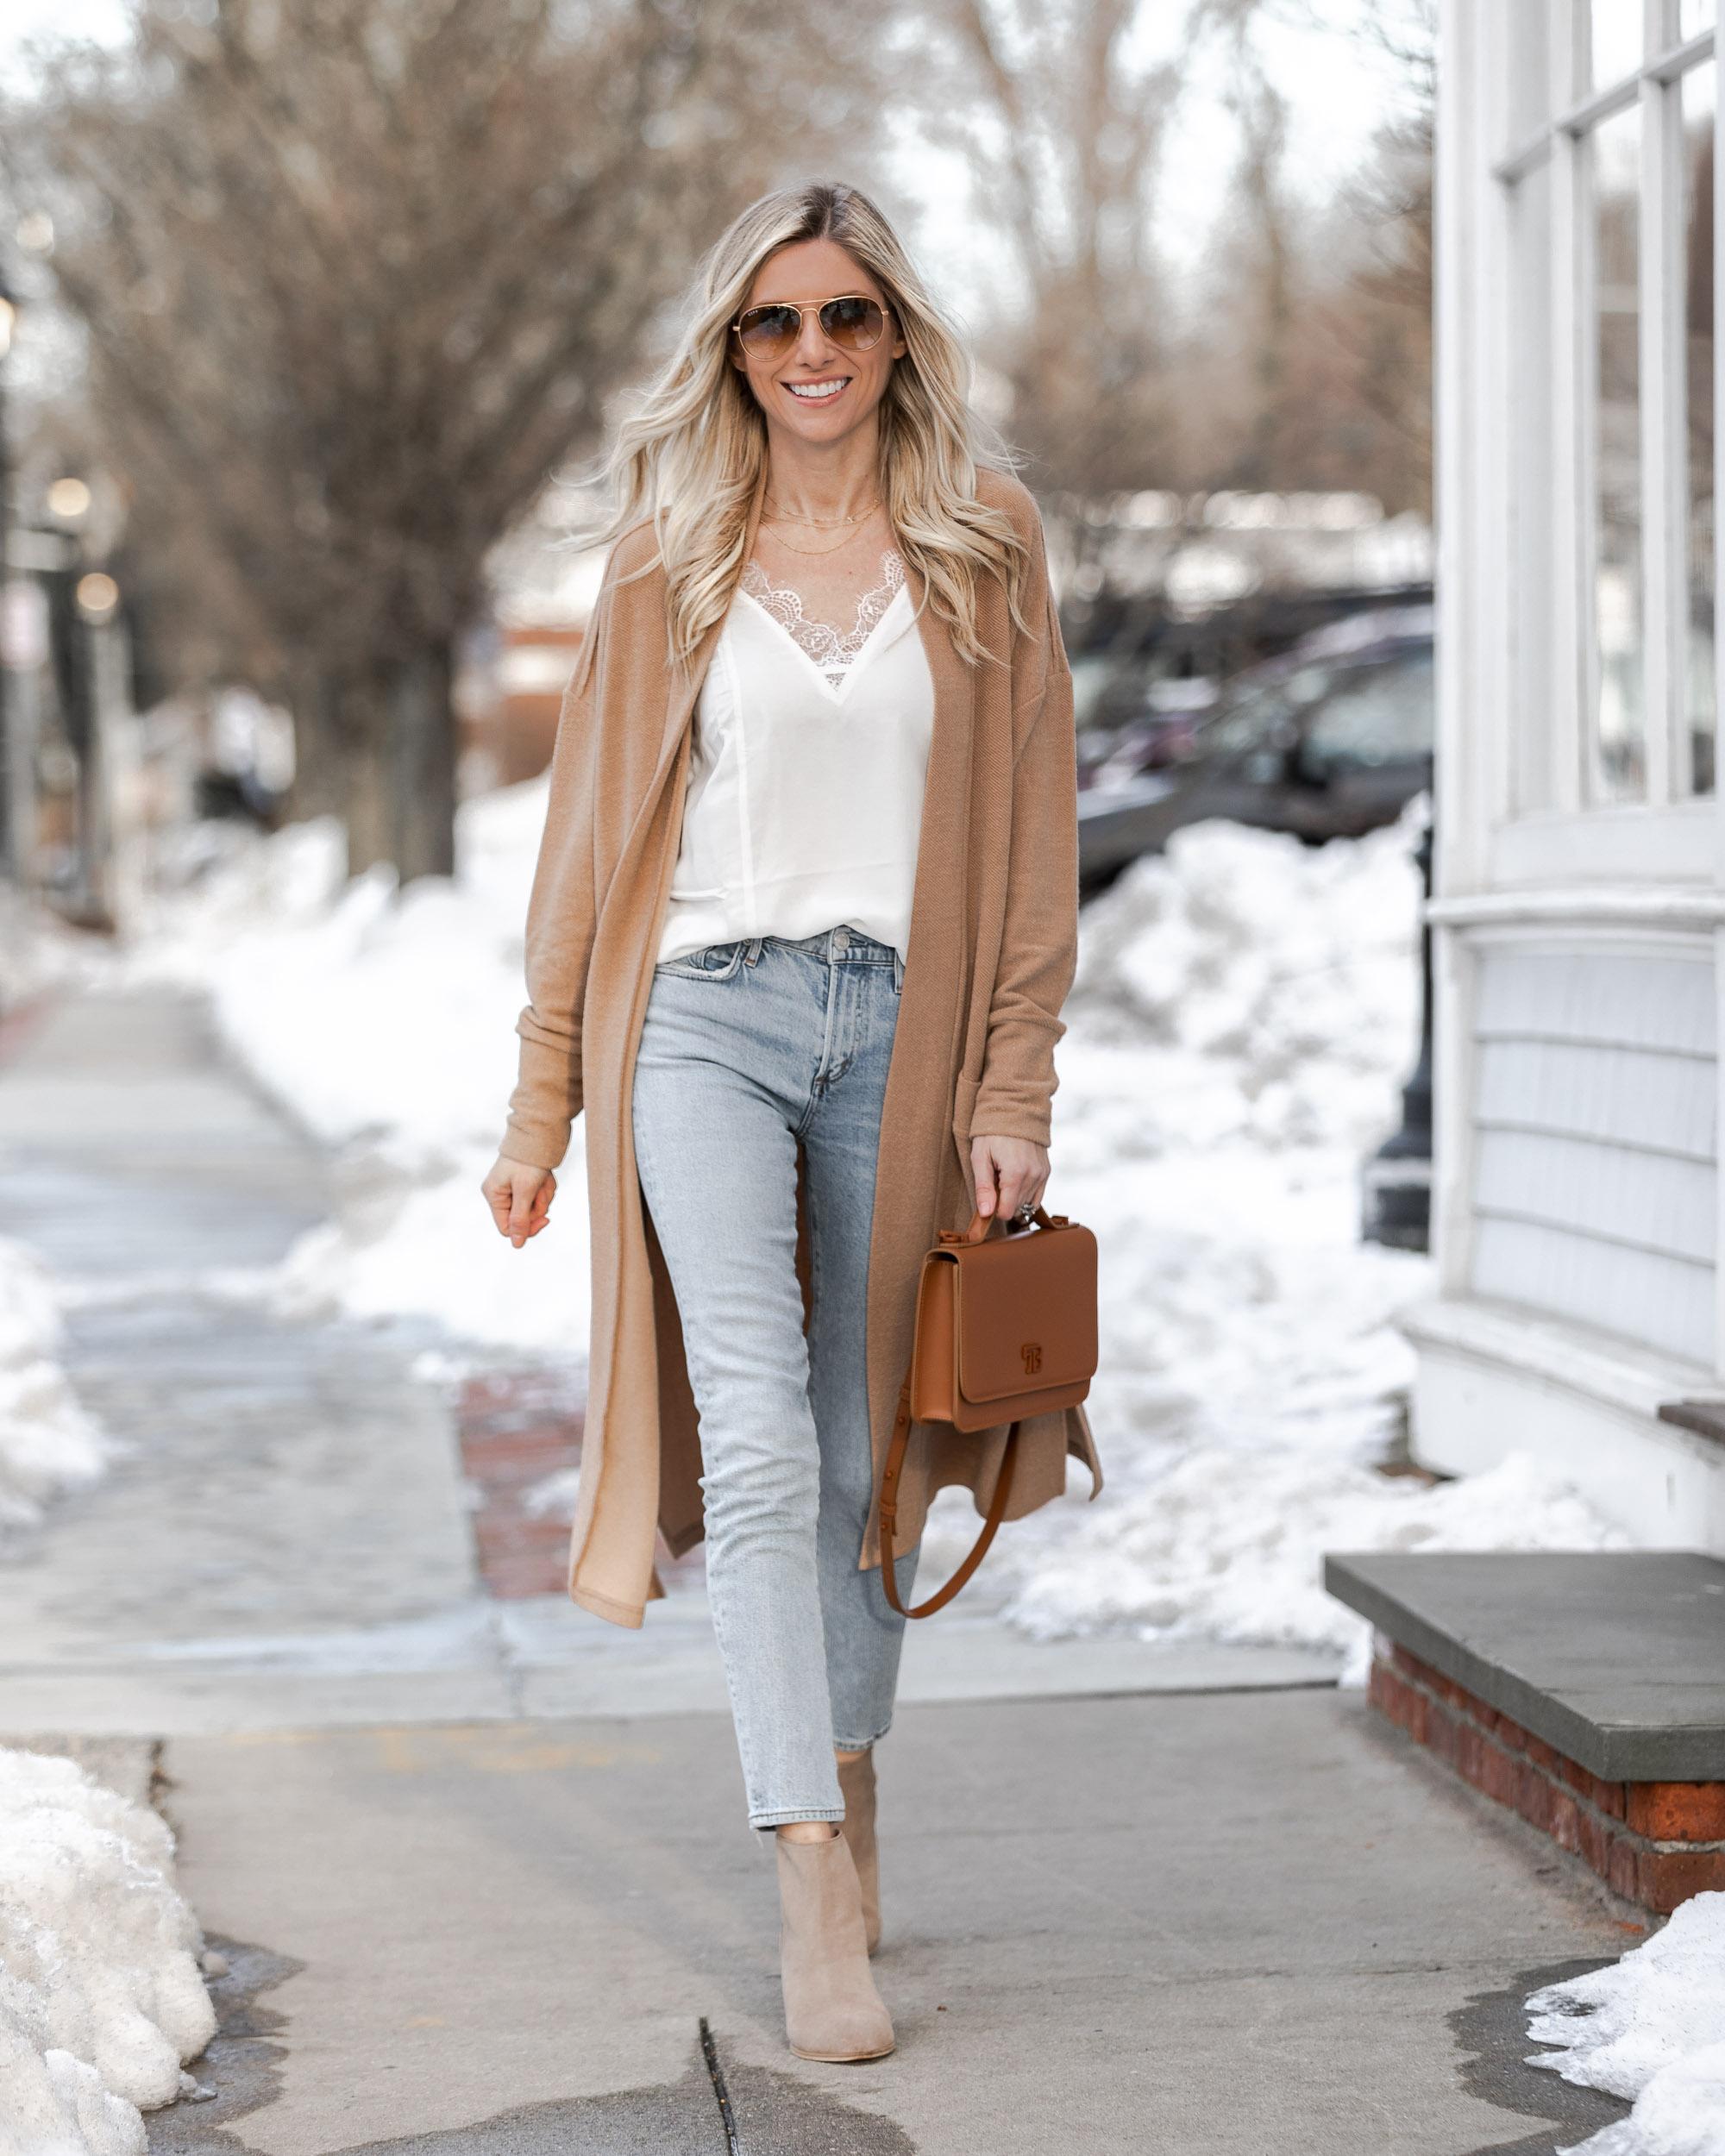 teddy-blake-affordable-and-well-made-handbags-the-glamorous-gal